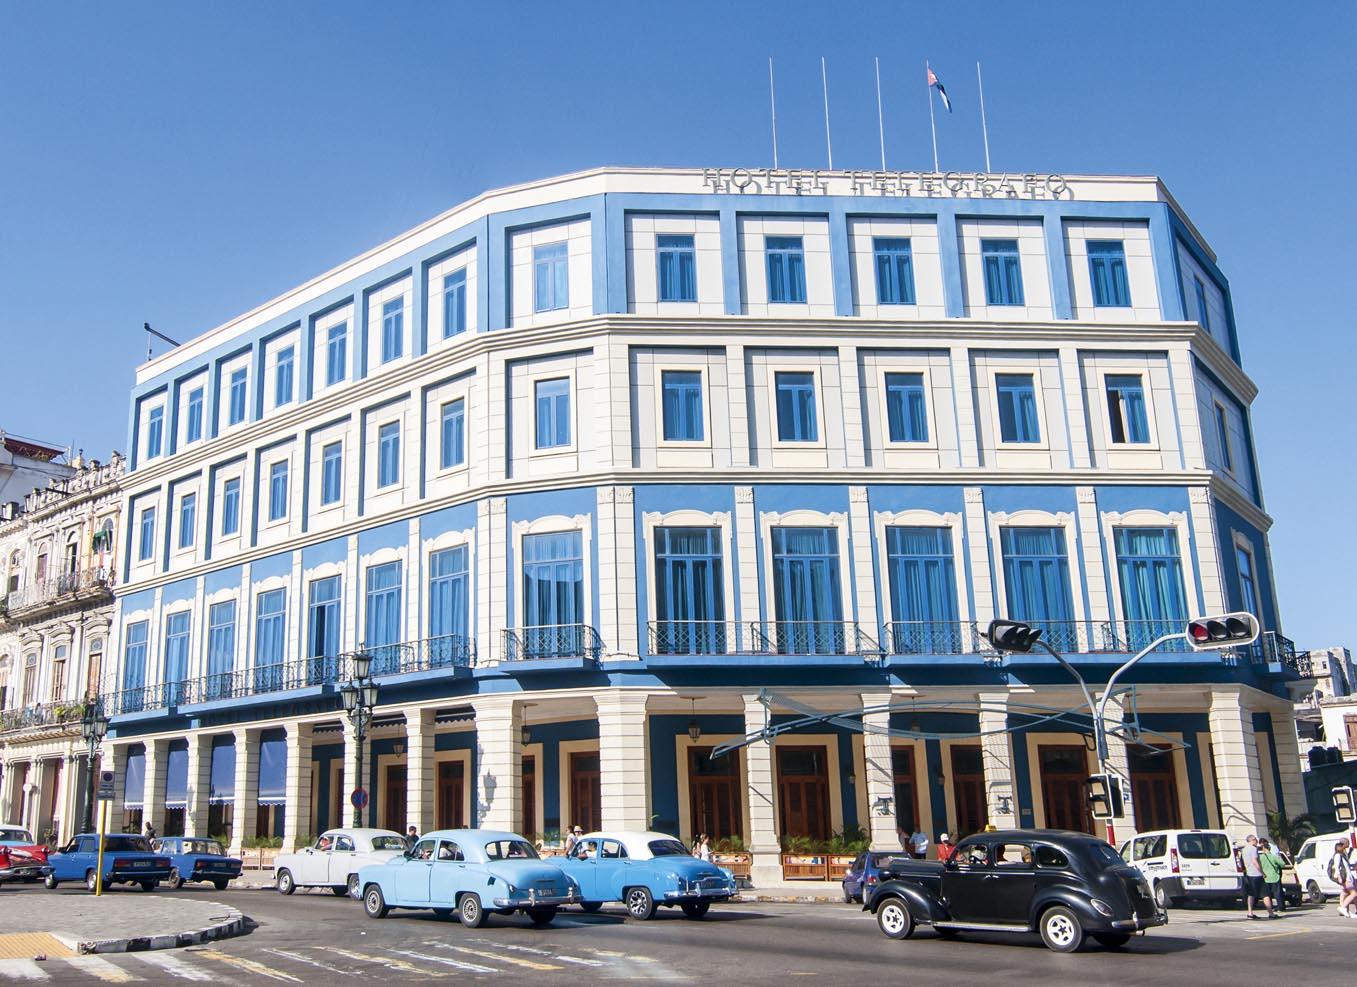 Cadena española anuncia apertura en Cuba de hotel para el colectivo LGTBI+